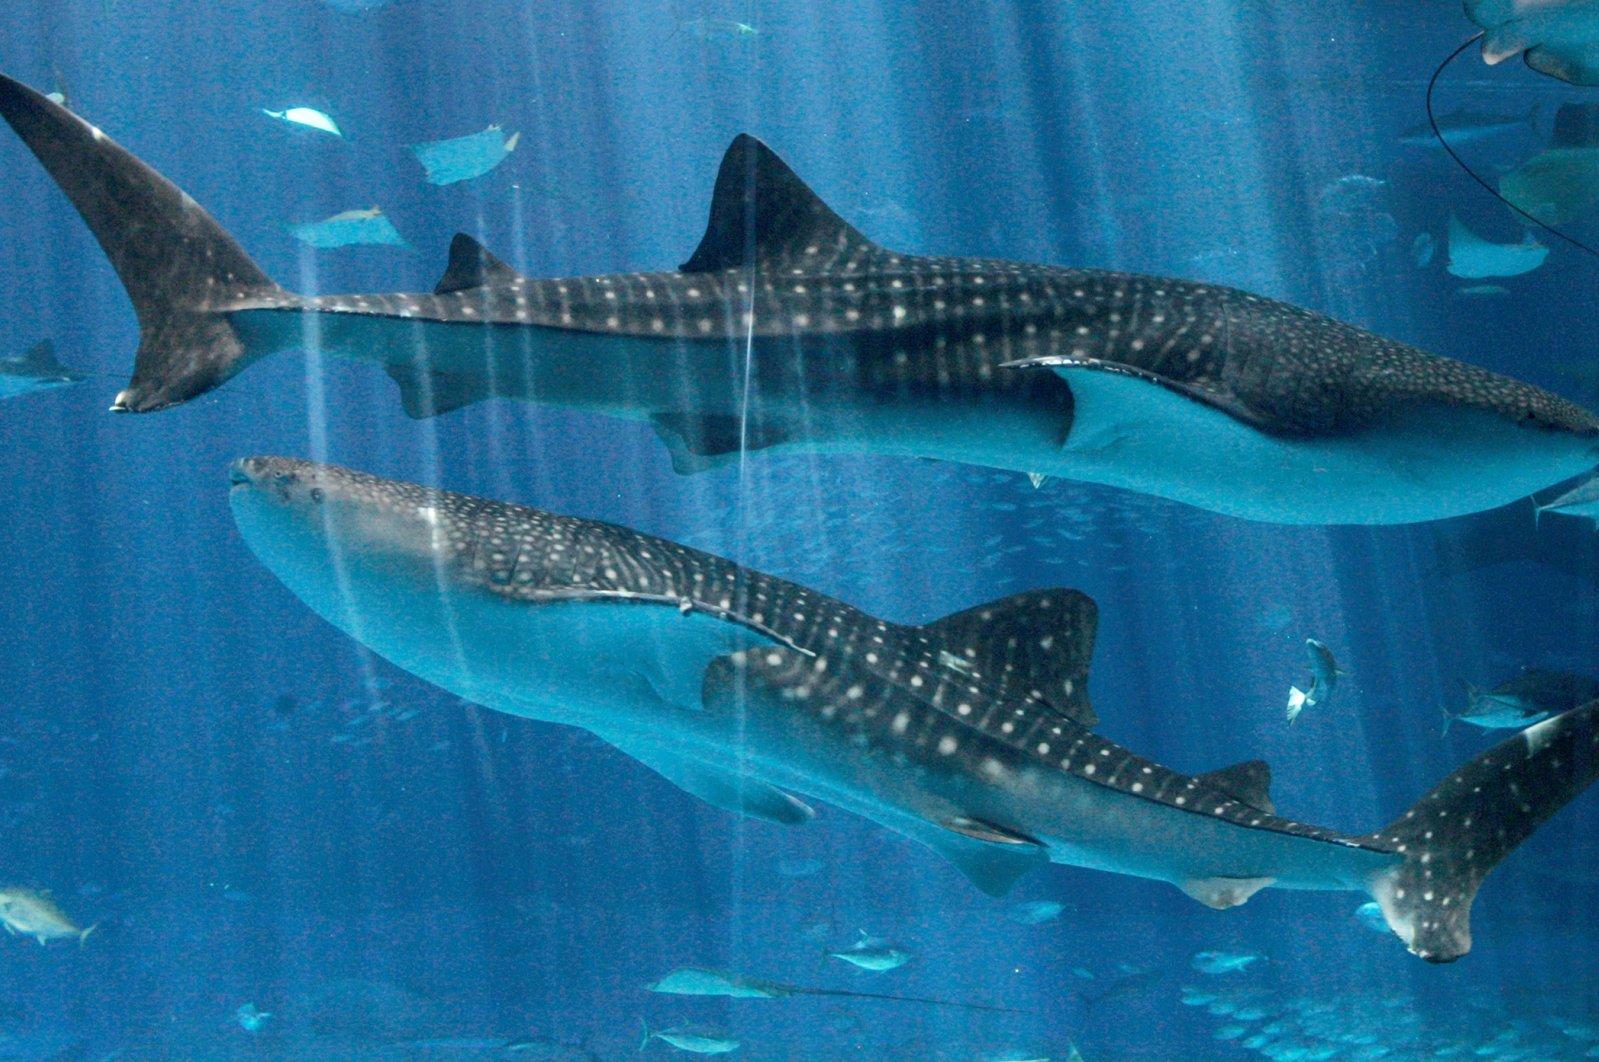 Whale sharks swim at Okinawa Churaumi Aquarium in Motobu town on Japan's southern island of Okinawa July 9, 2007. (Reuters Photo)